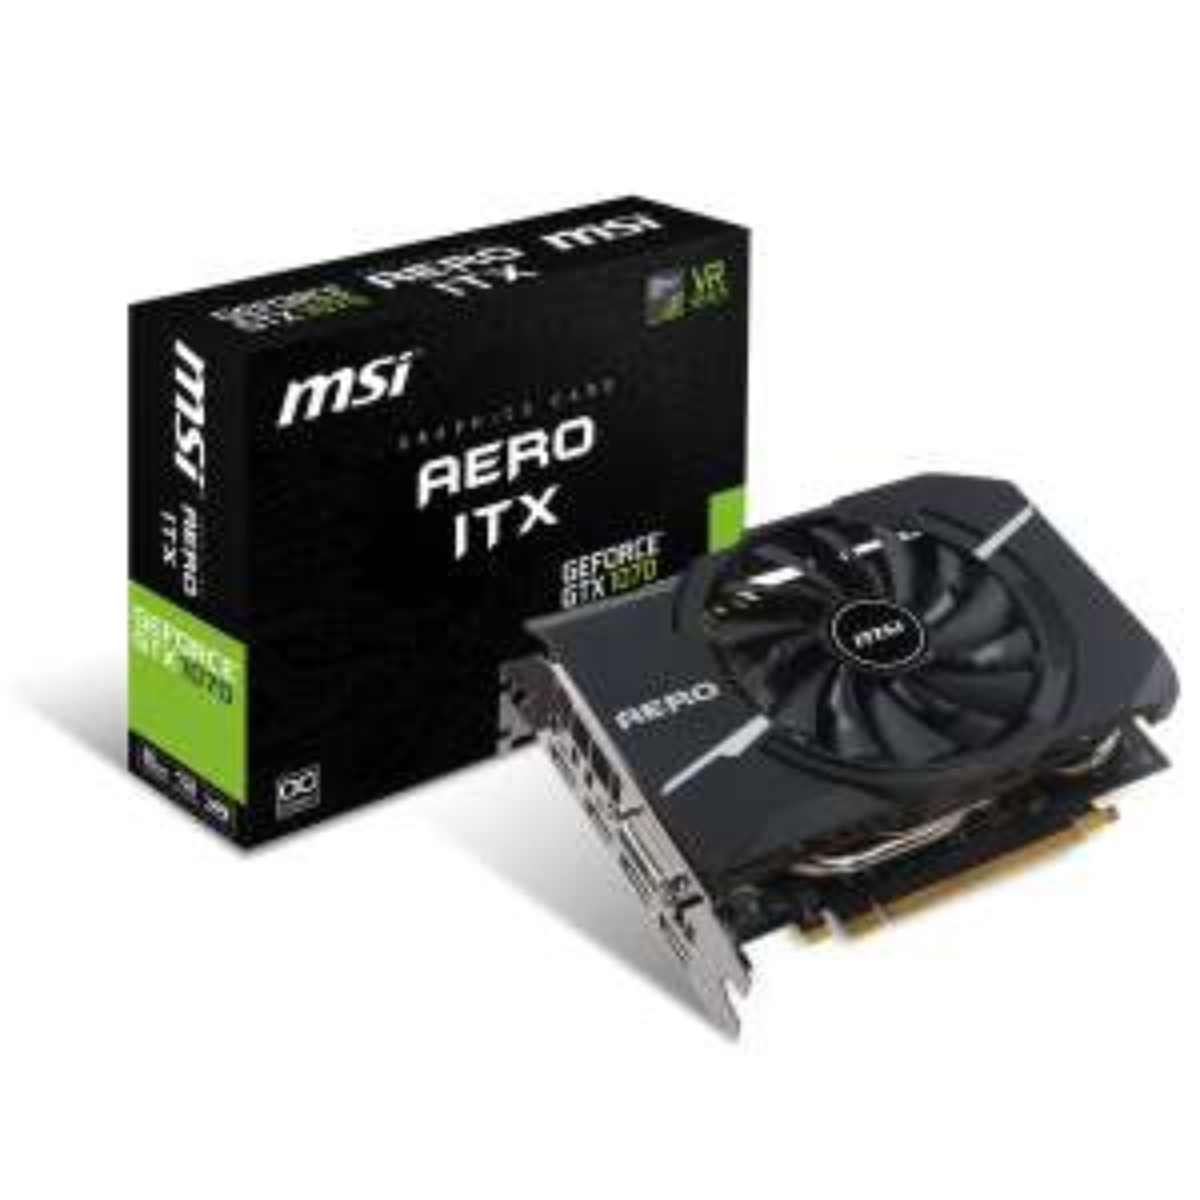 [Cdiscount à volonté] Carte graphique MSI GeForce GTX 1070 AERO ITX 8G OC